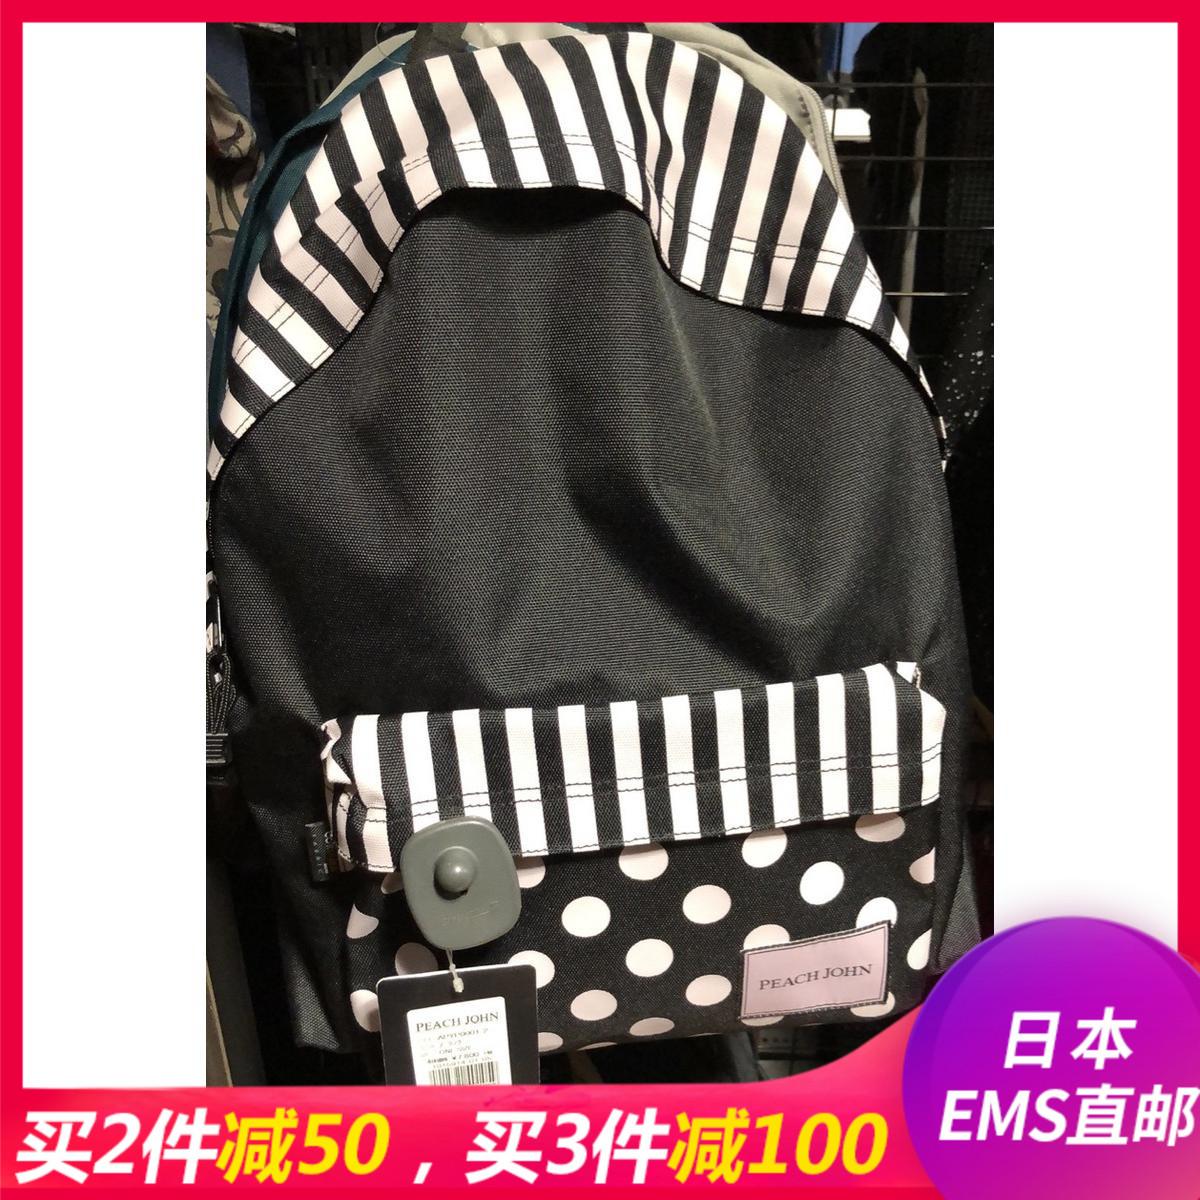 yoyi日本代购PEACH JOHN波点女士双肩包APYP0001-2